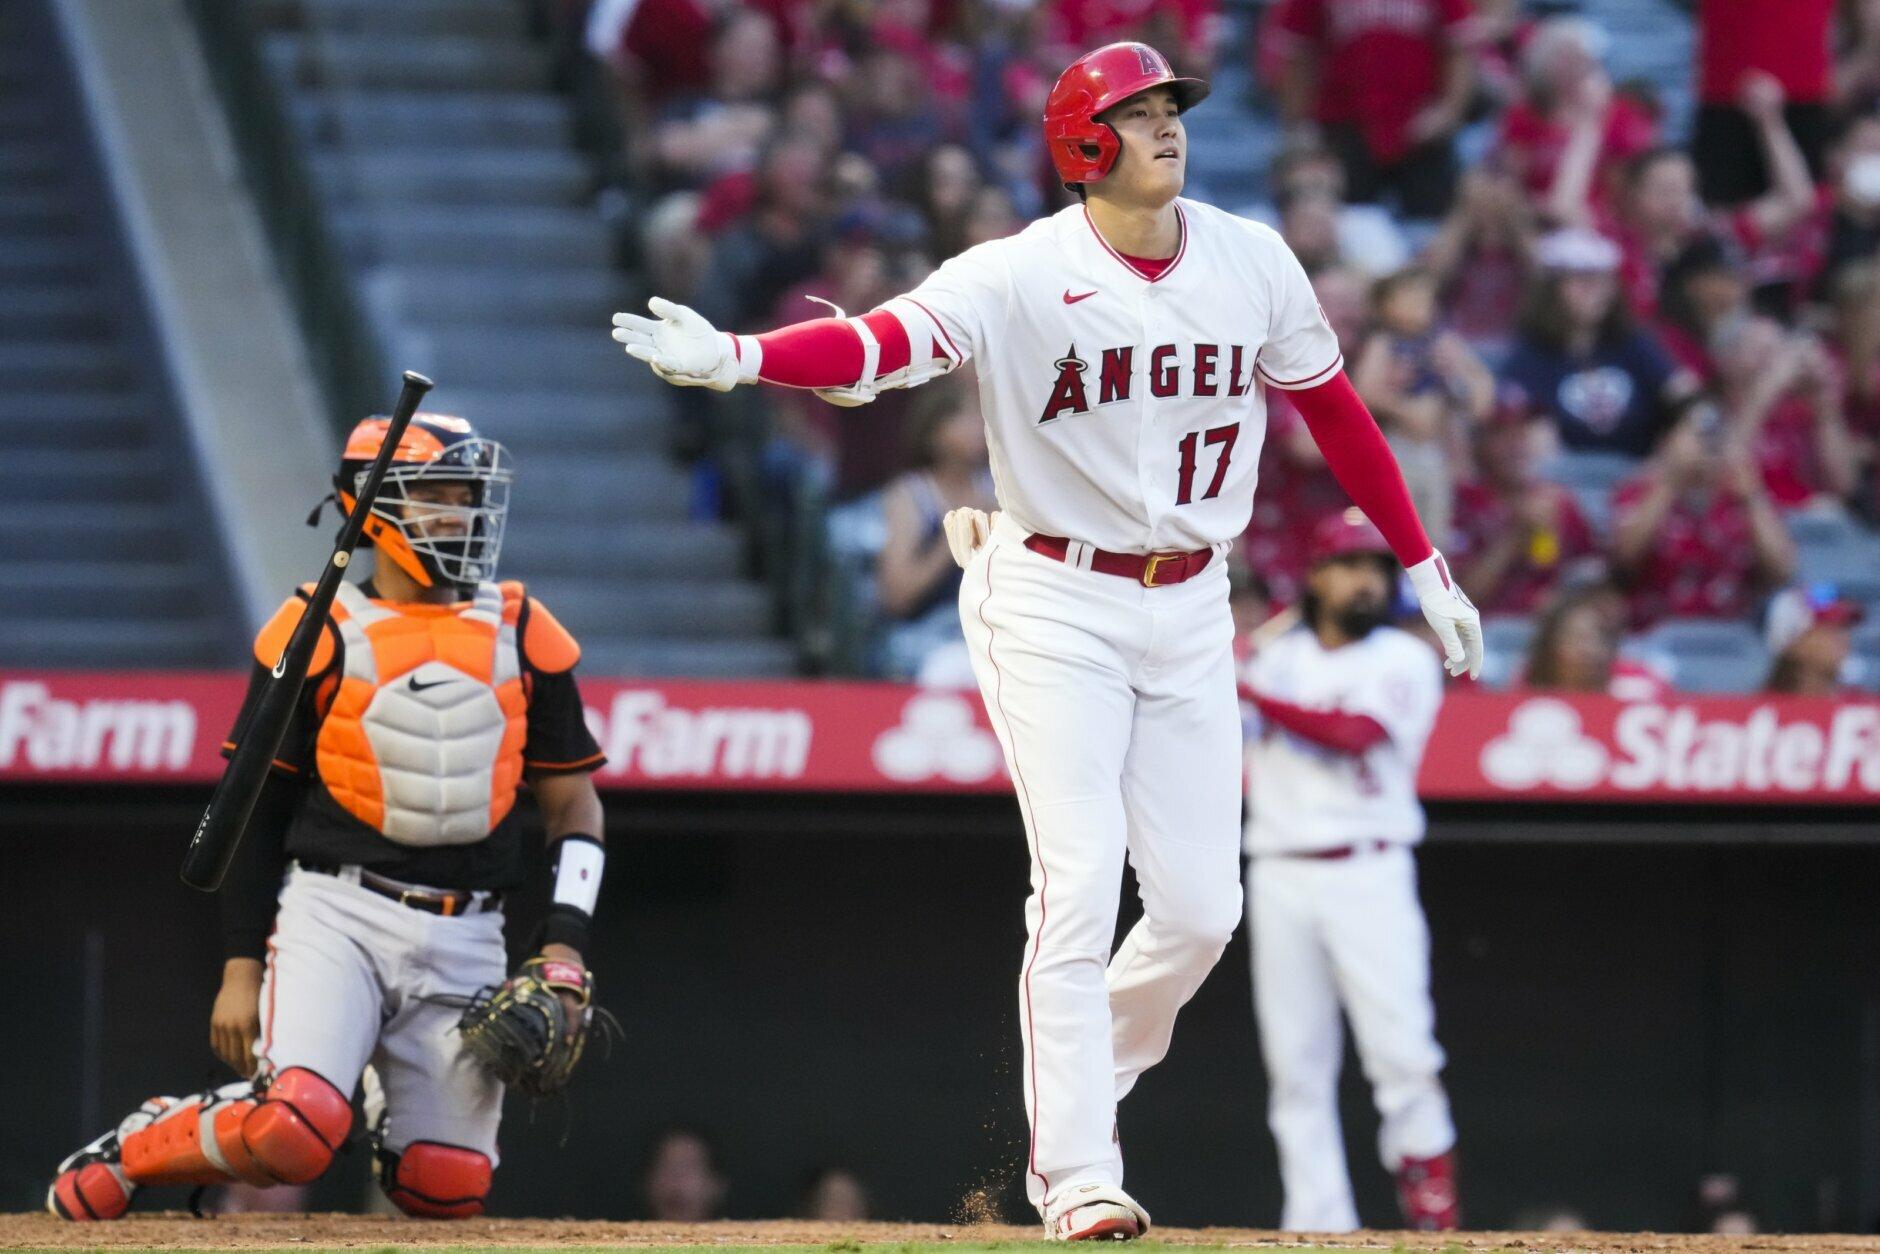 Orioles_Angels_Baseball_91556-1880x1254